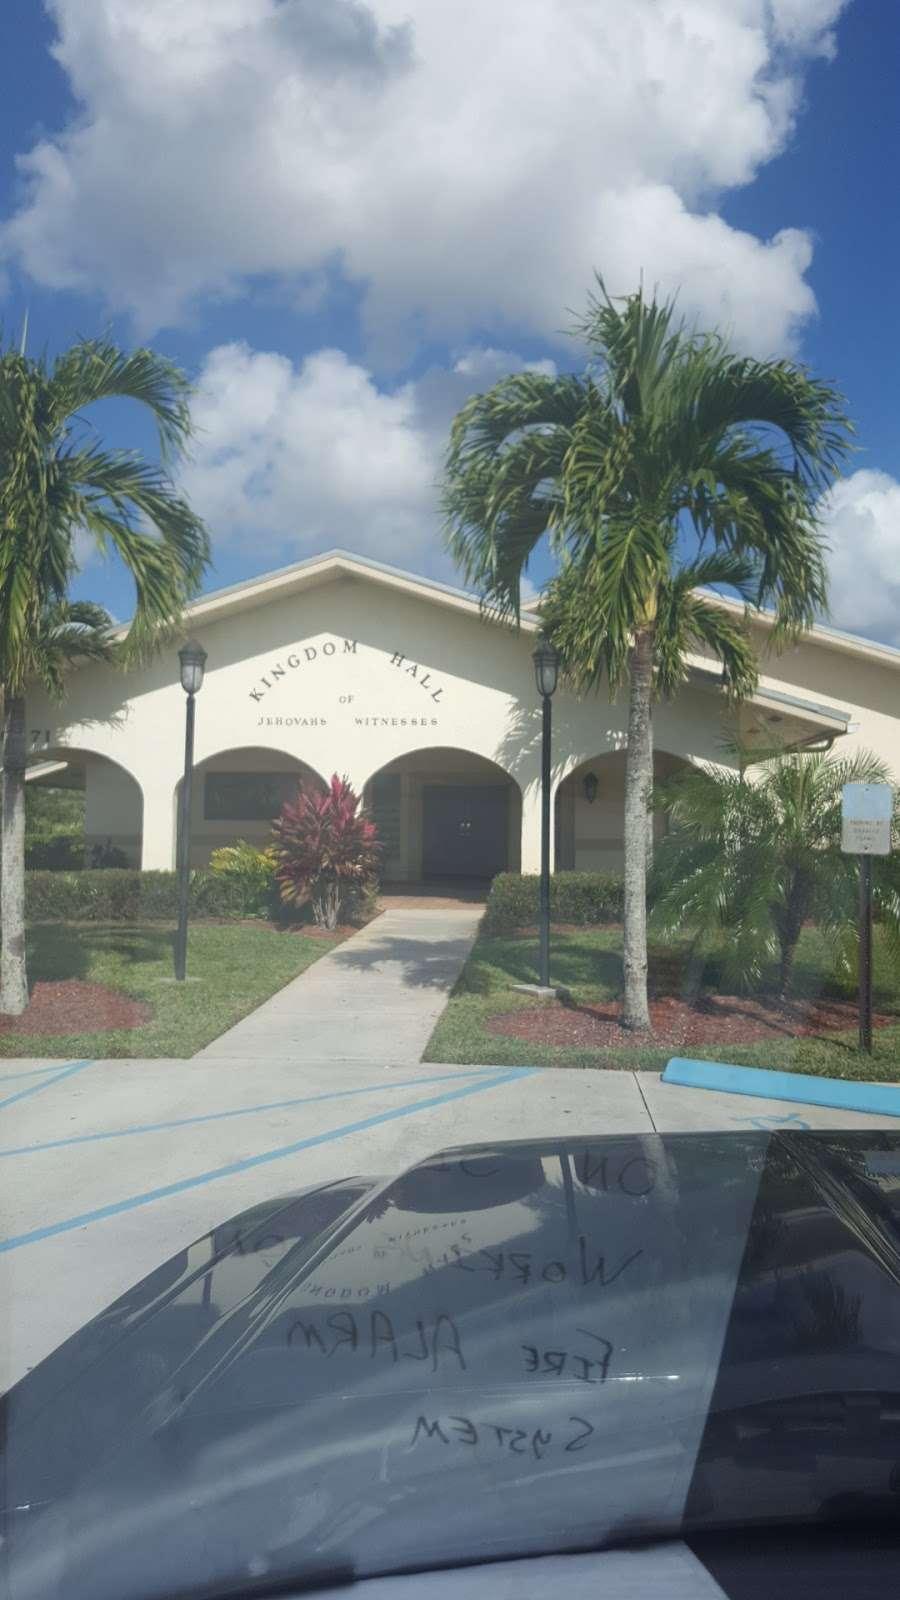 Kingdom Hall of Jehovahs Witnesses - church  | Photo 1 of 3 | Address: 16571 Velazquez Blvd, Loxahatchee, FL 33470, USA | Phone: (561) 790-2804